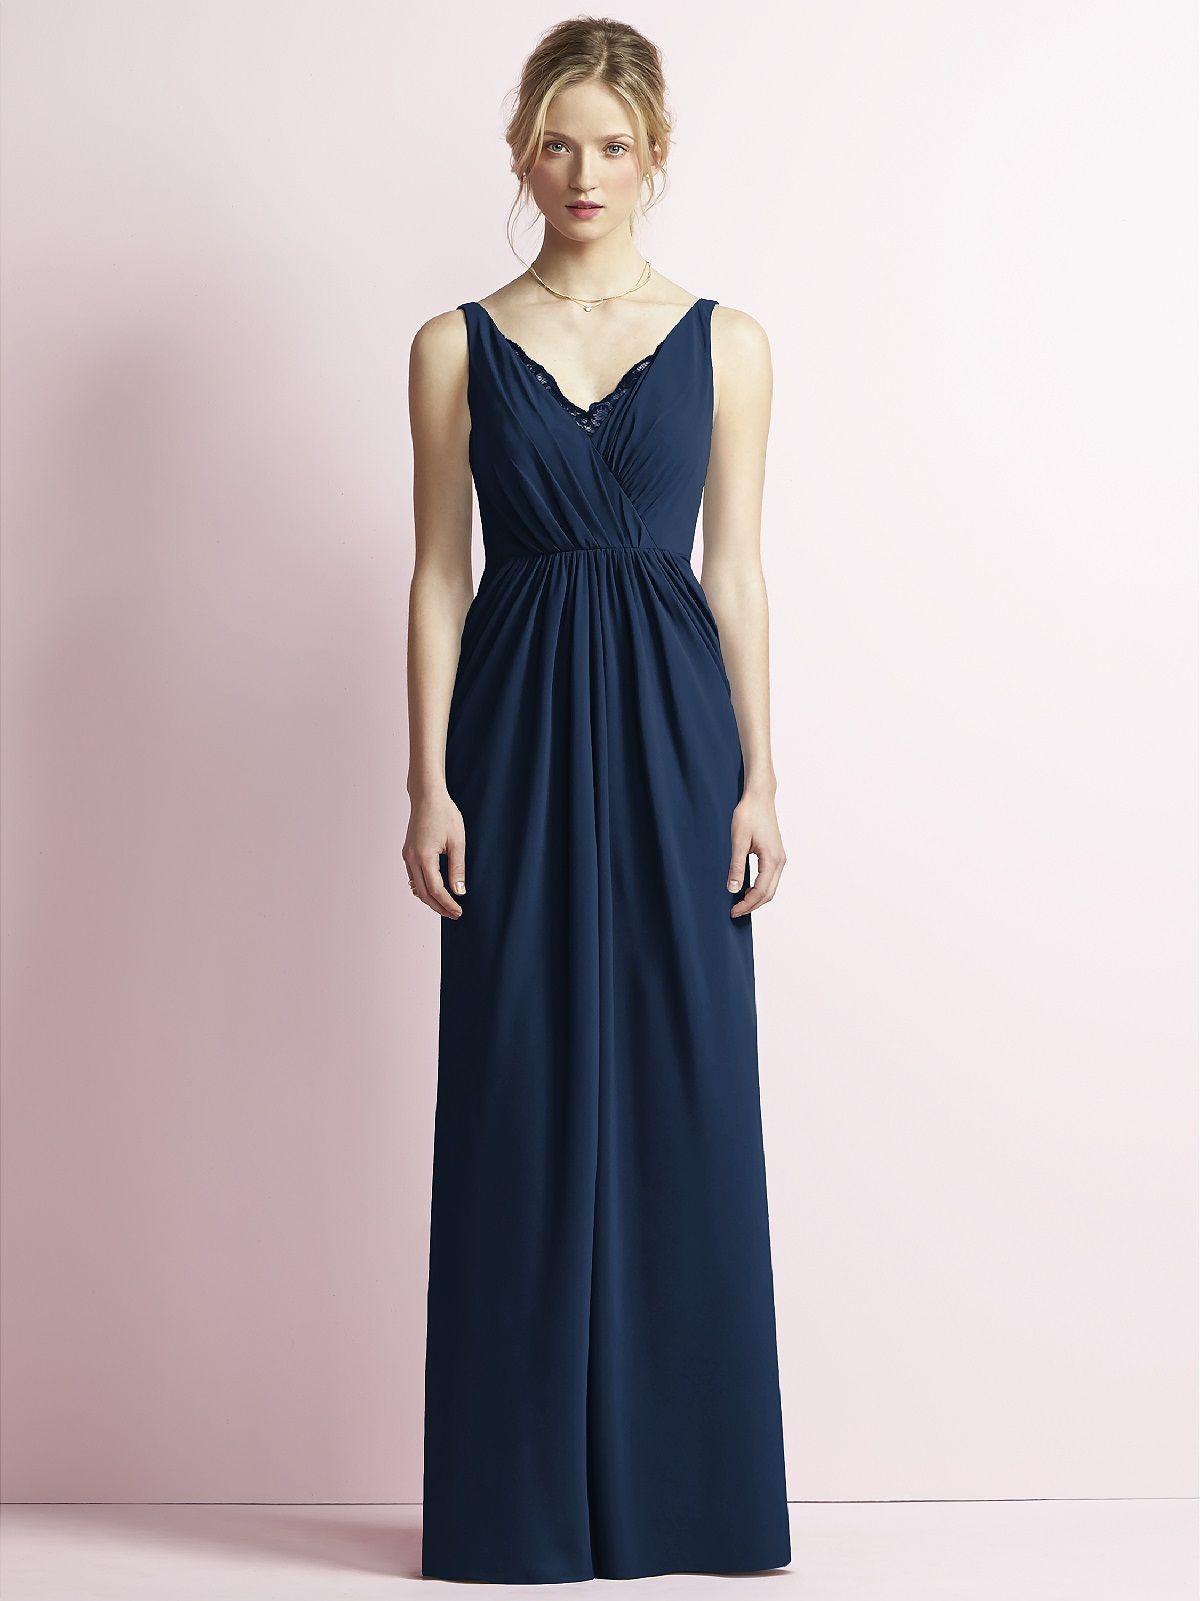 Loving this long blue bridesmaid dress jenny yoo by dessy is loving this long blue bridesmaid dress jenny yoo by dessy is available at the bridal ombrellifo Choice Image